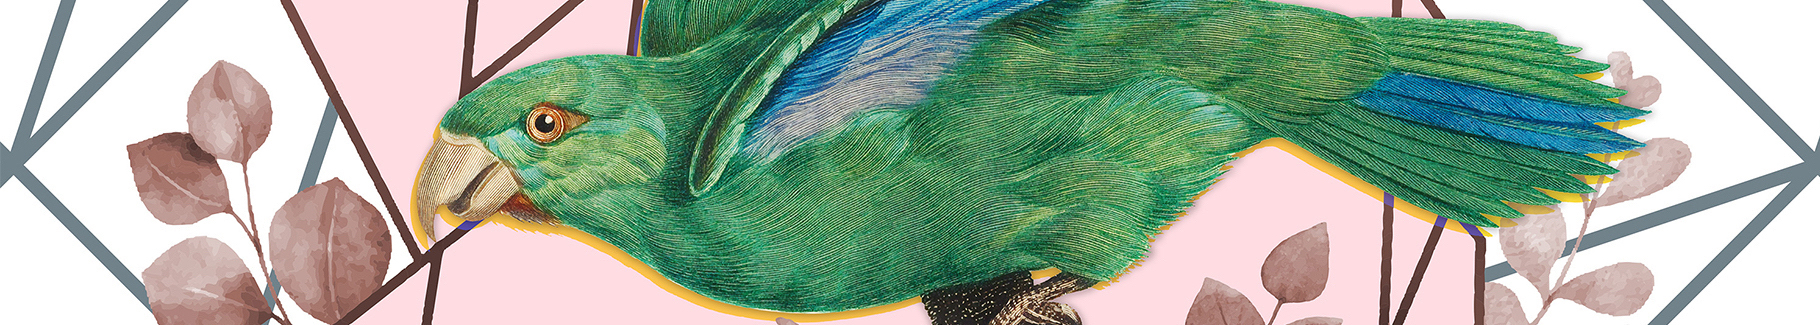 Plakat Marigold Parakeet na geometrycznym tle